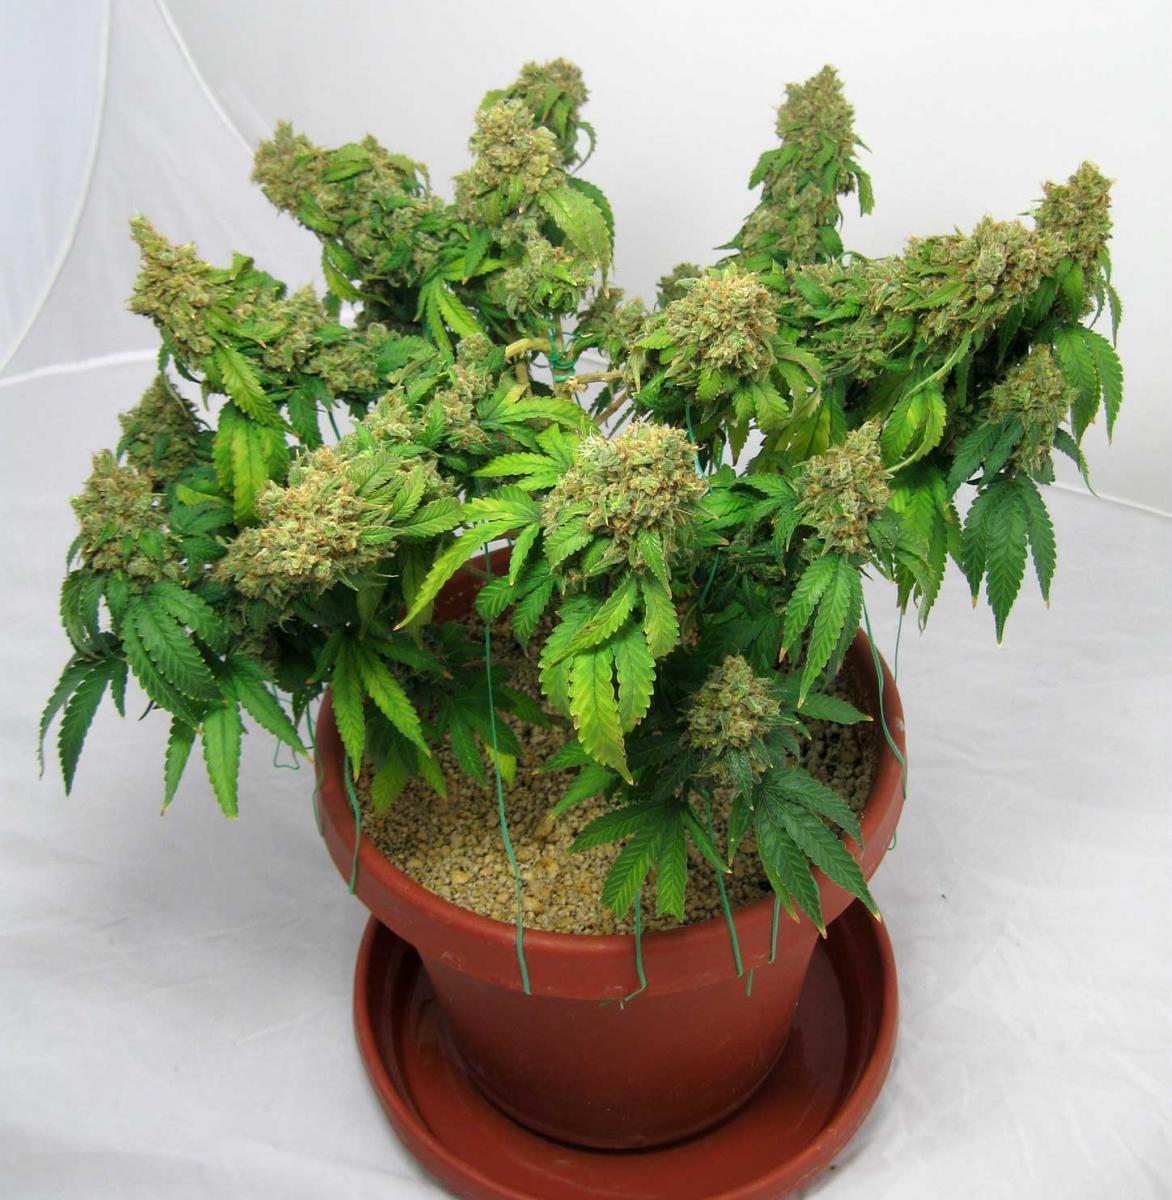 Super Cropping Marijuana Simple Secret To Bigger Yields Grow Weed Easy